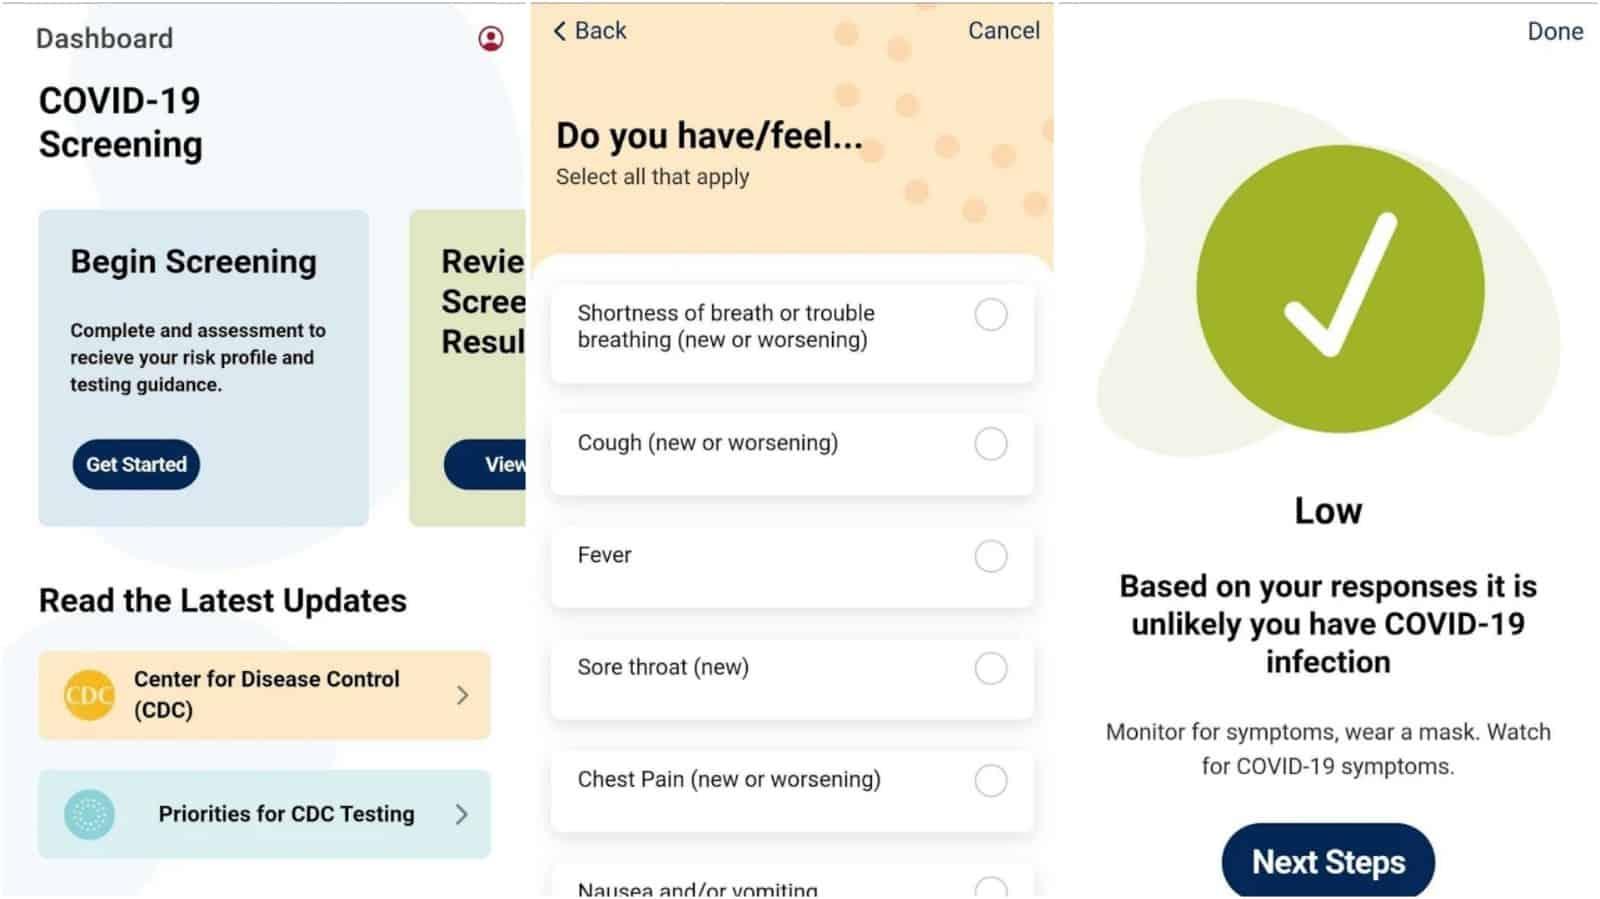 CheckCOVID app grid image